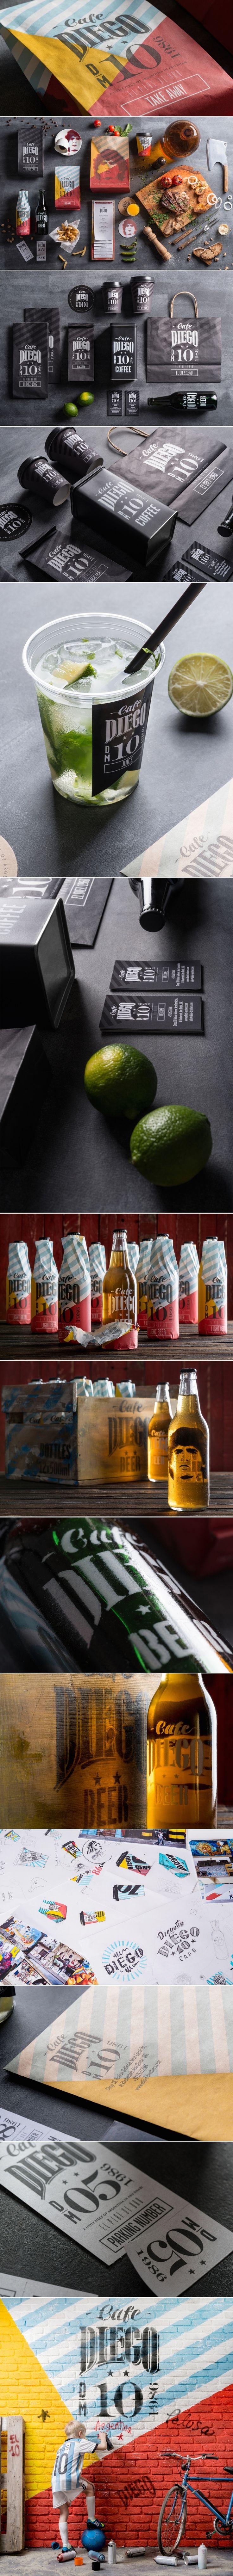 Cafe Diego — The Dieline | Packaging & Branding Design & Innovation News